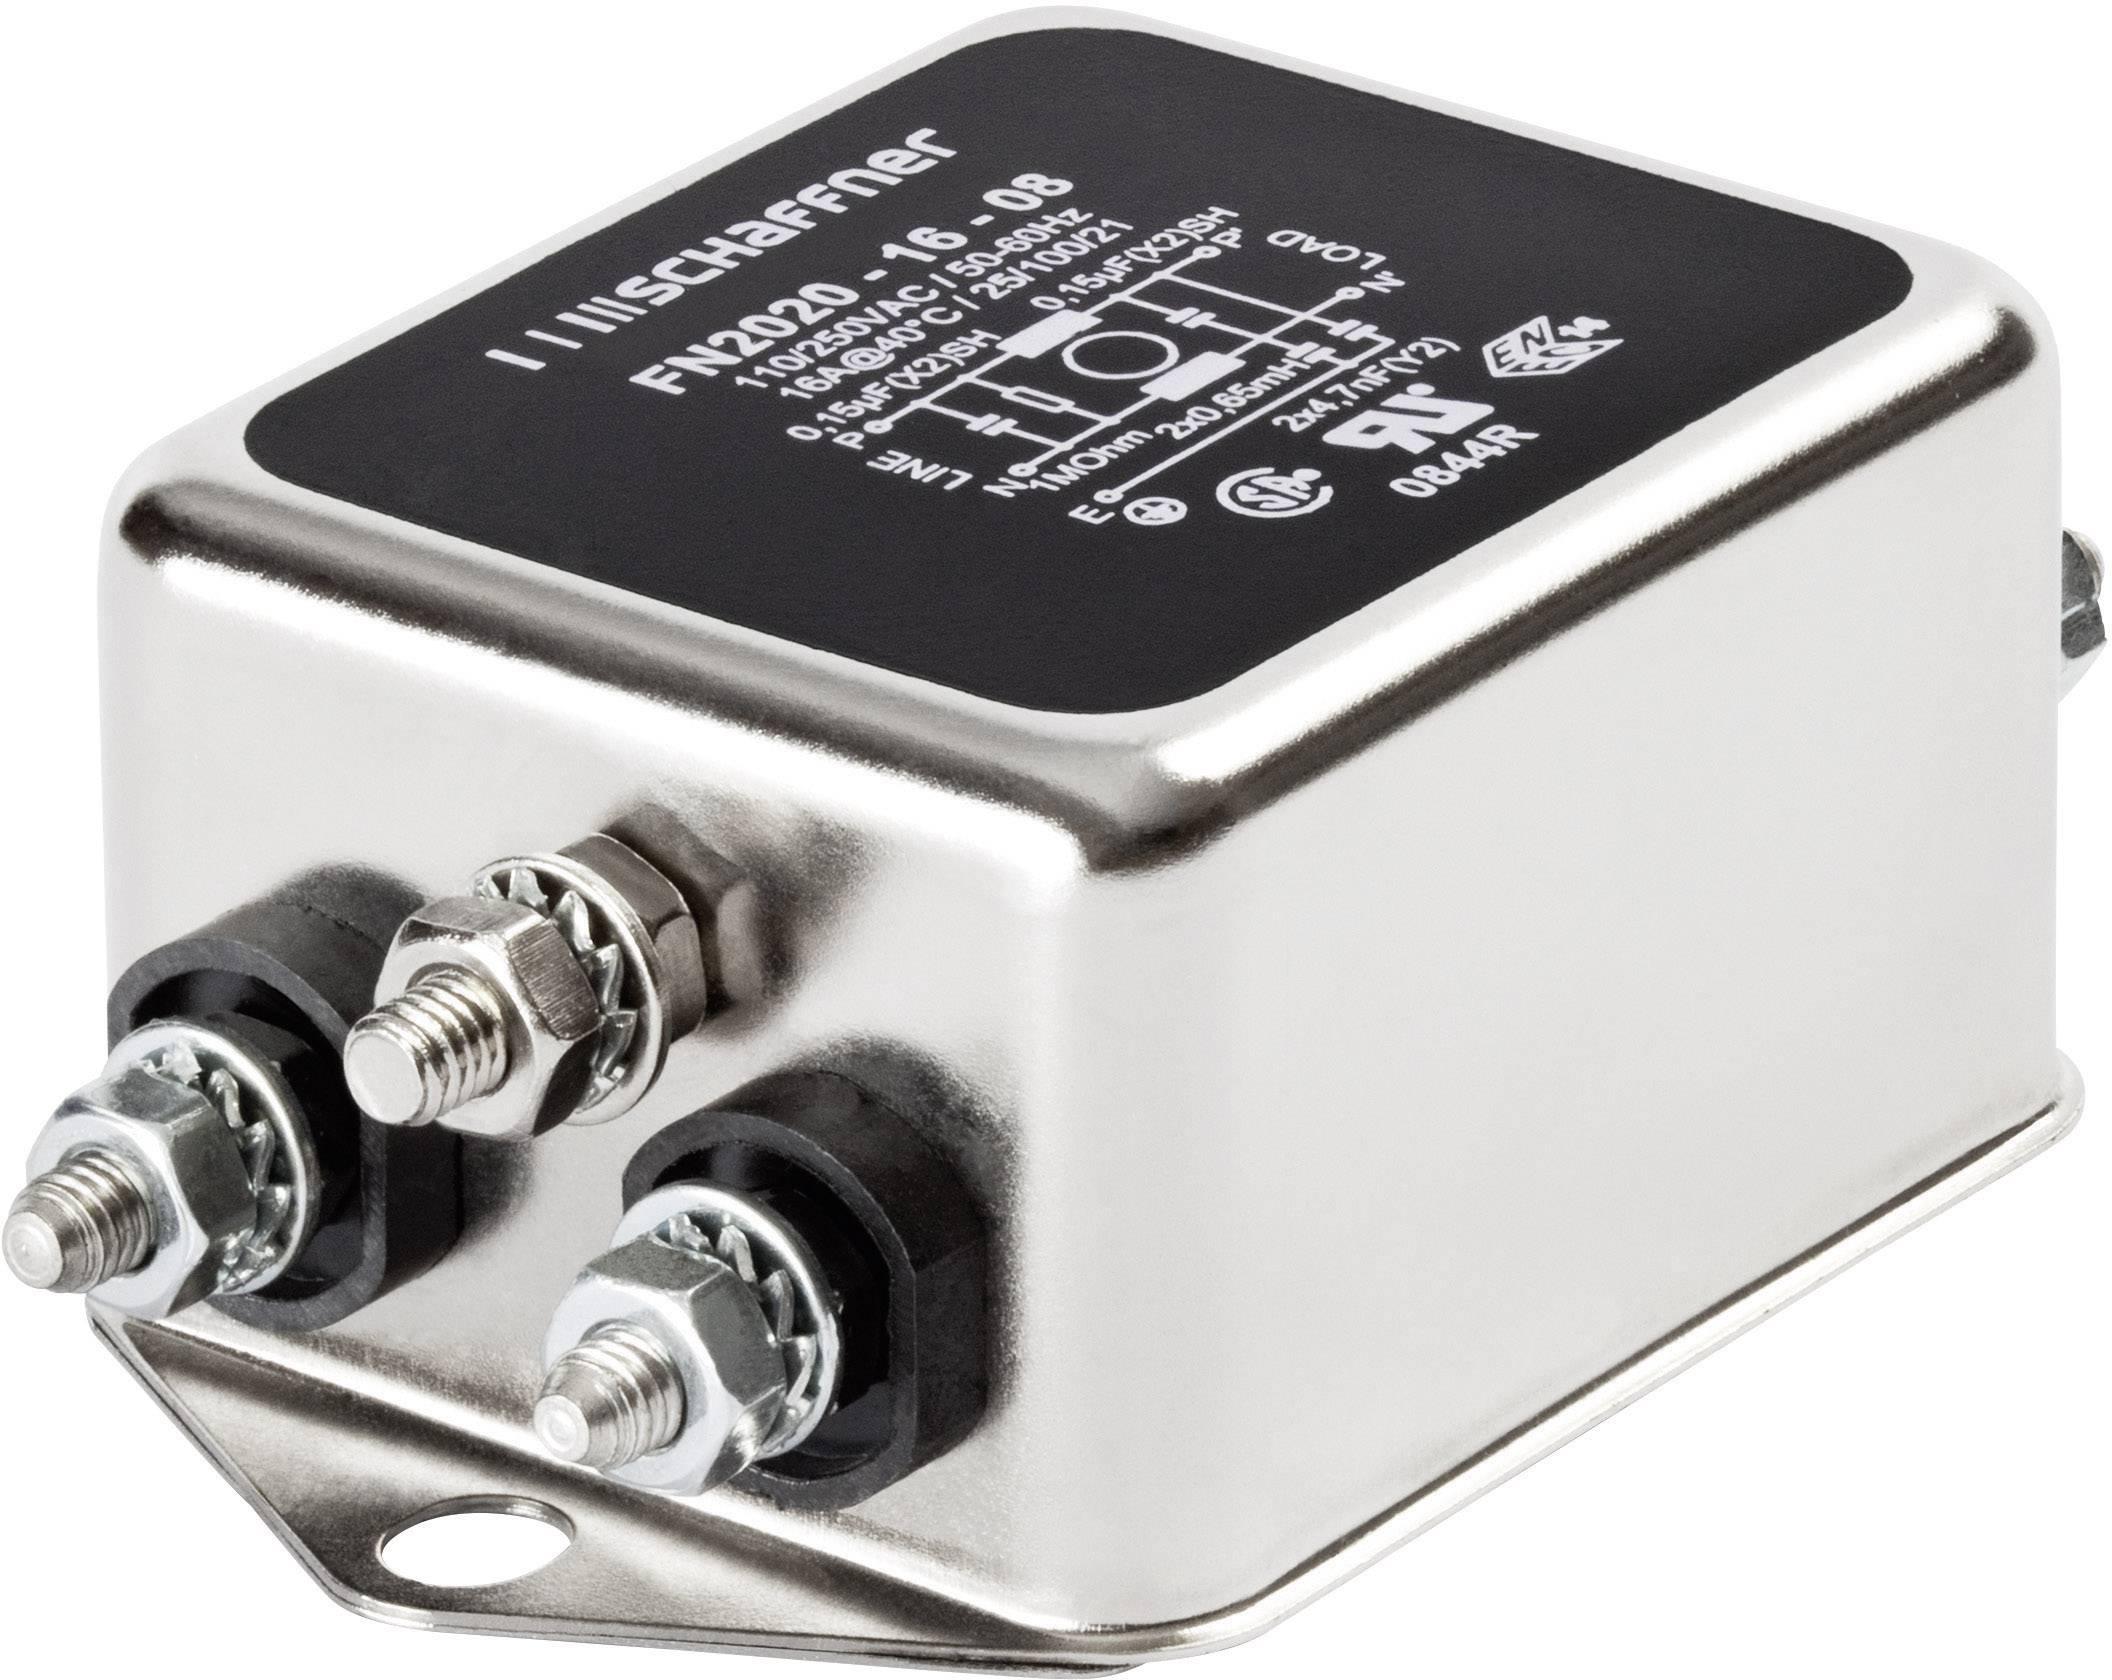 Odrušovací filter Schaffner FN 2020-10-06 FN 2020-10-06, 250 V/AC, 10 A, 0.8 mH, (š x v) 64 mm x 29.3 mm, 1 ks